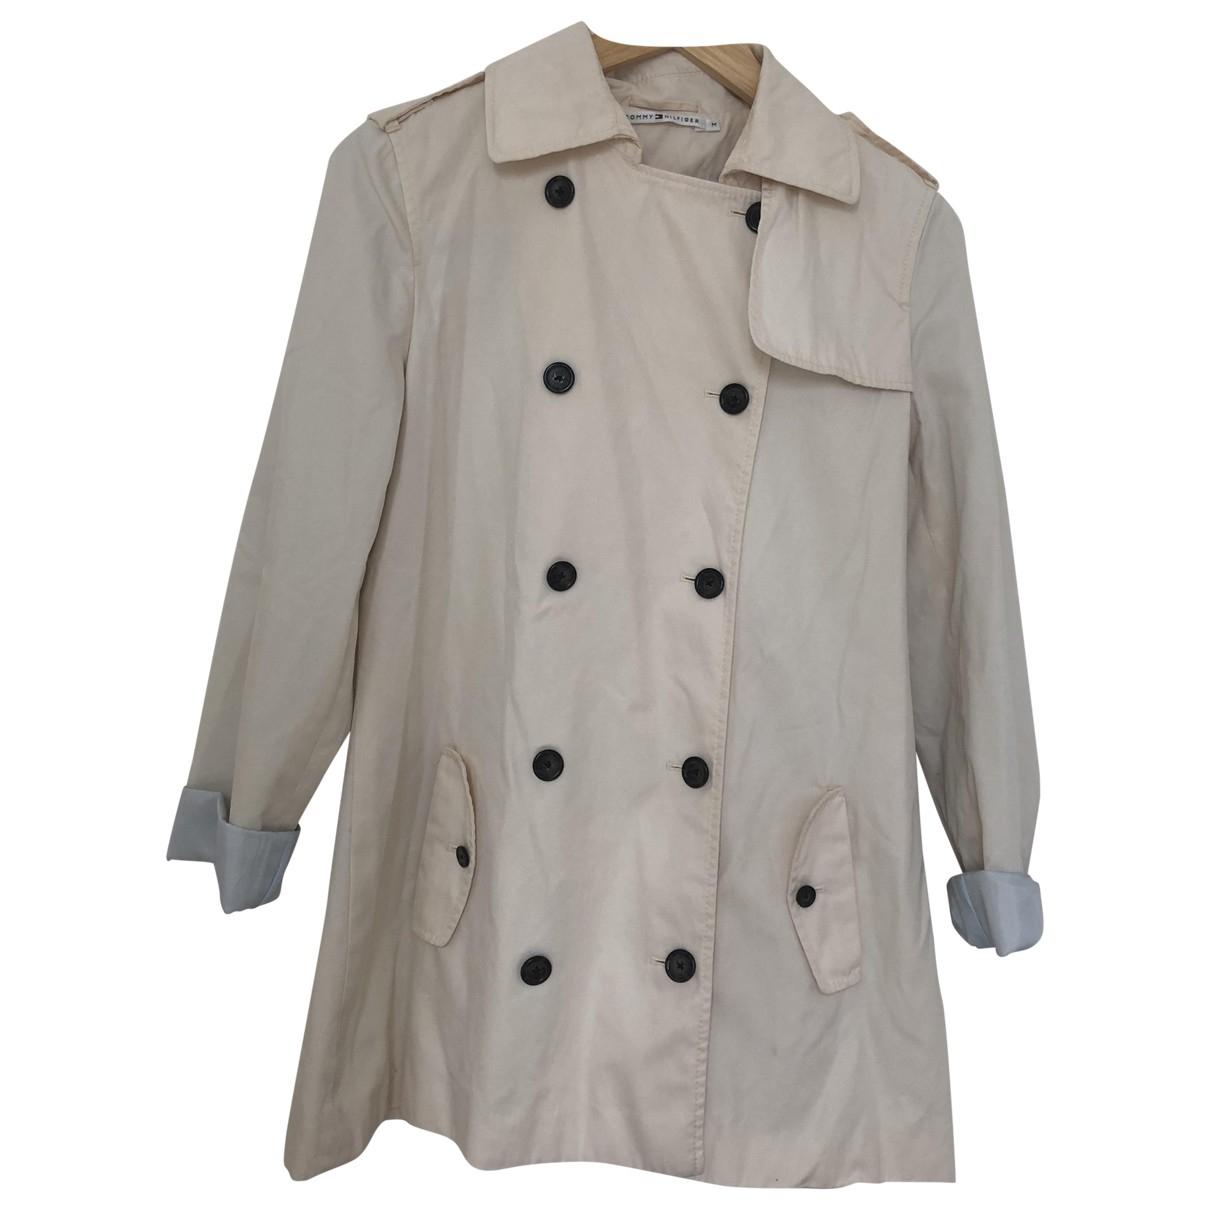 Tommy Hilfiger N Beige Cotton jacket for Women M International